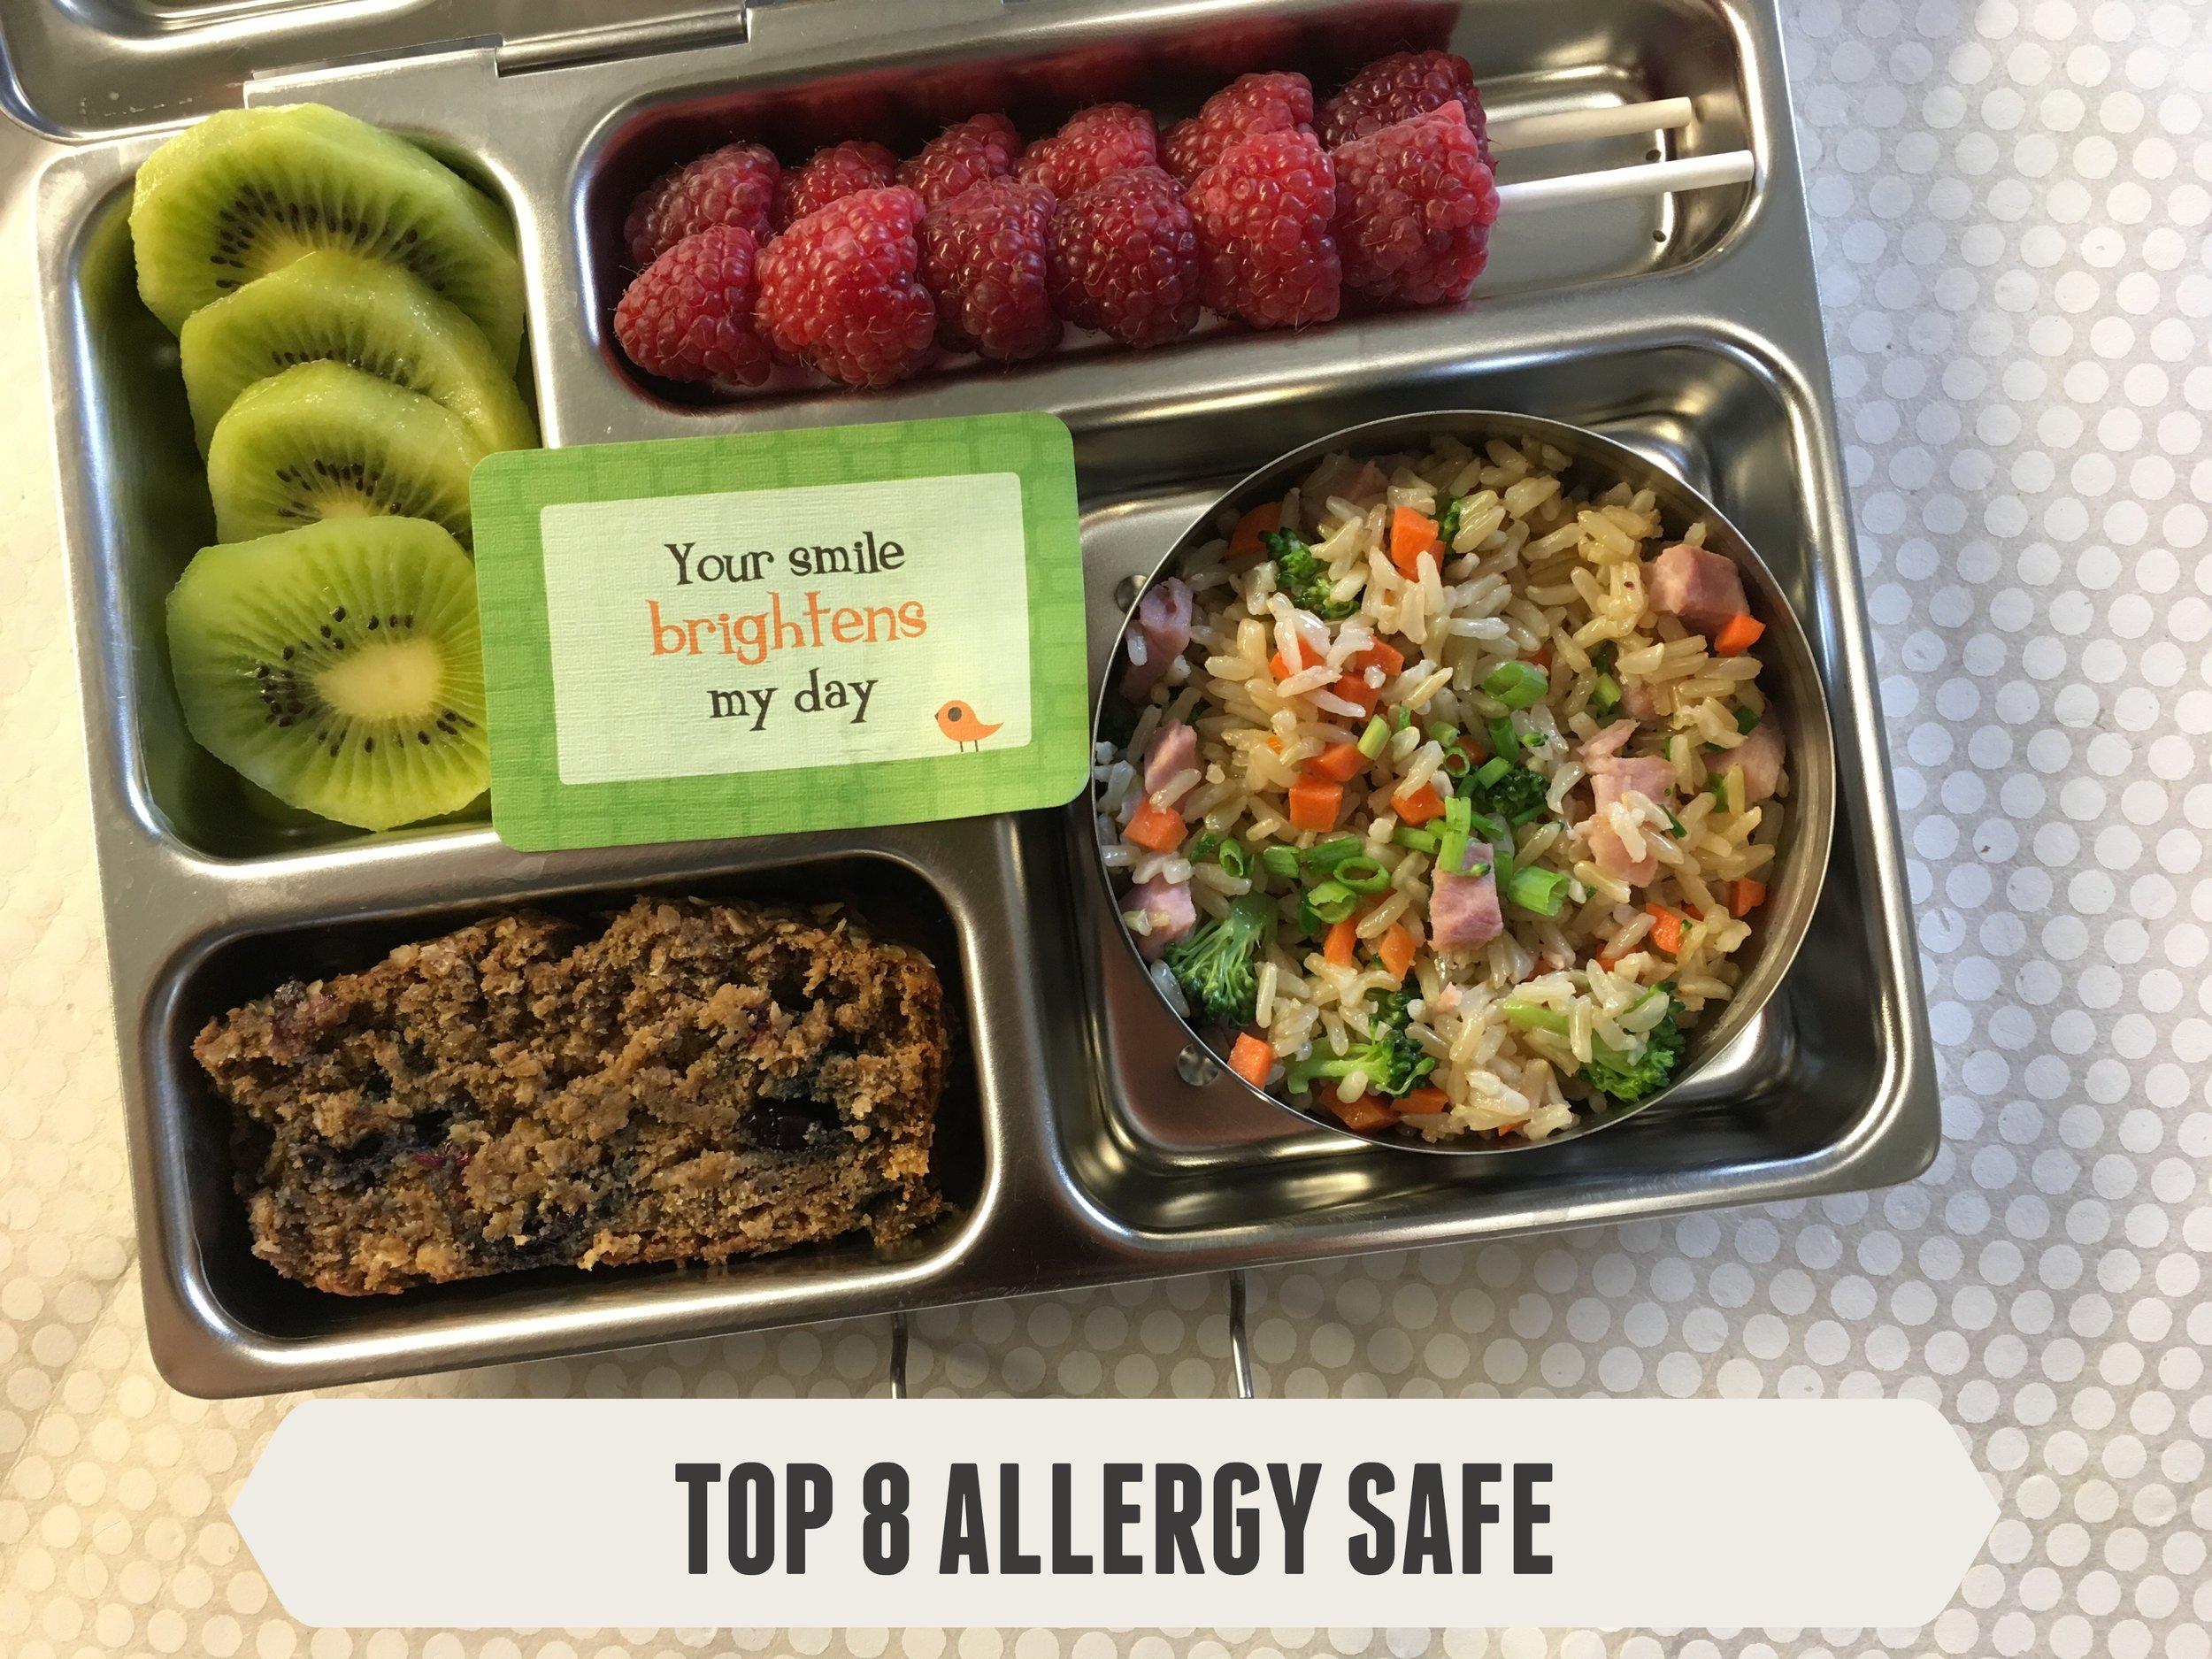 Top 8 Allergy Safe #10